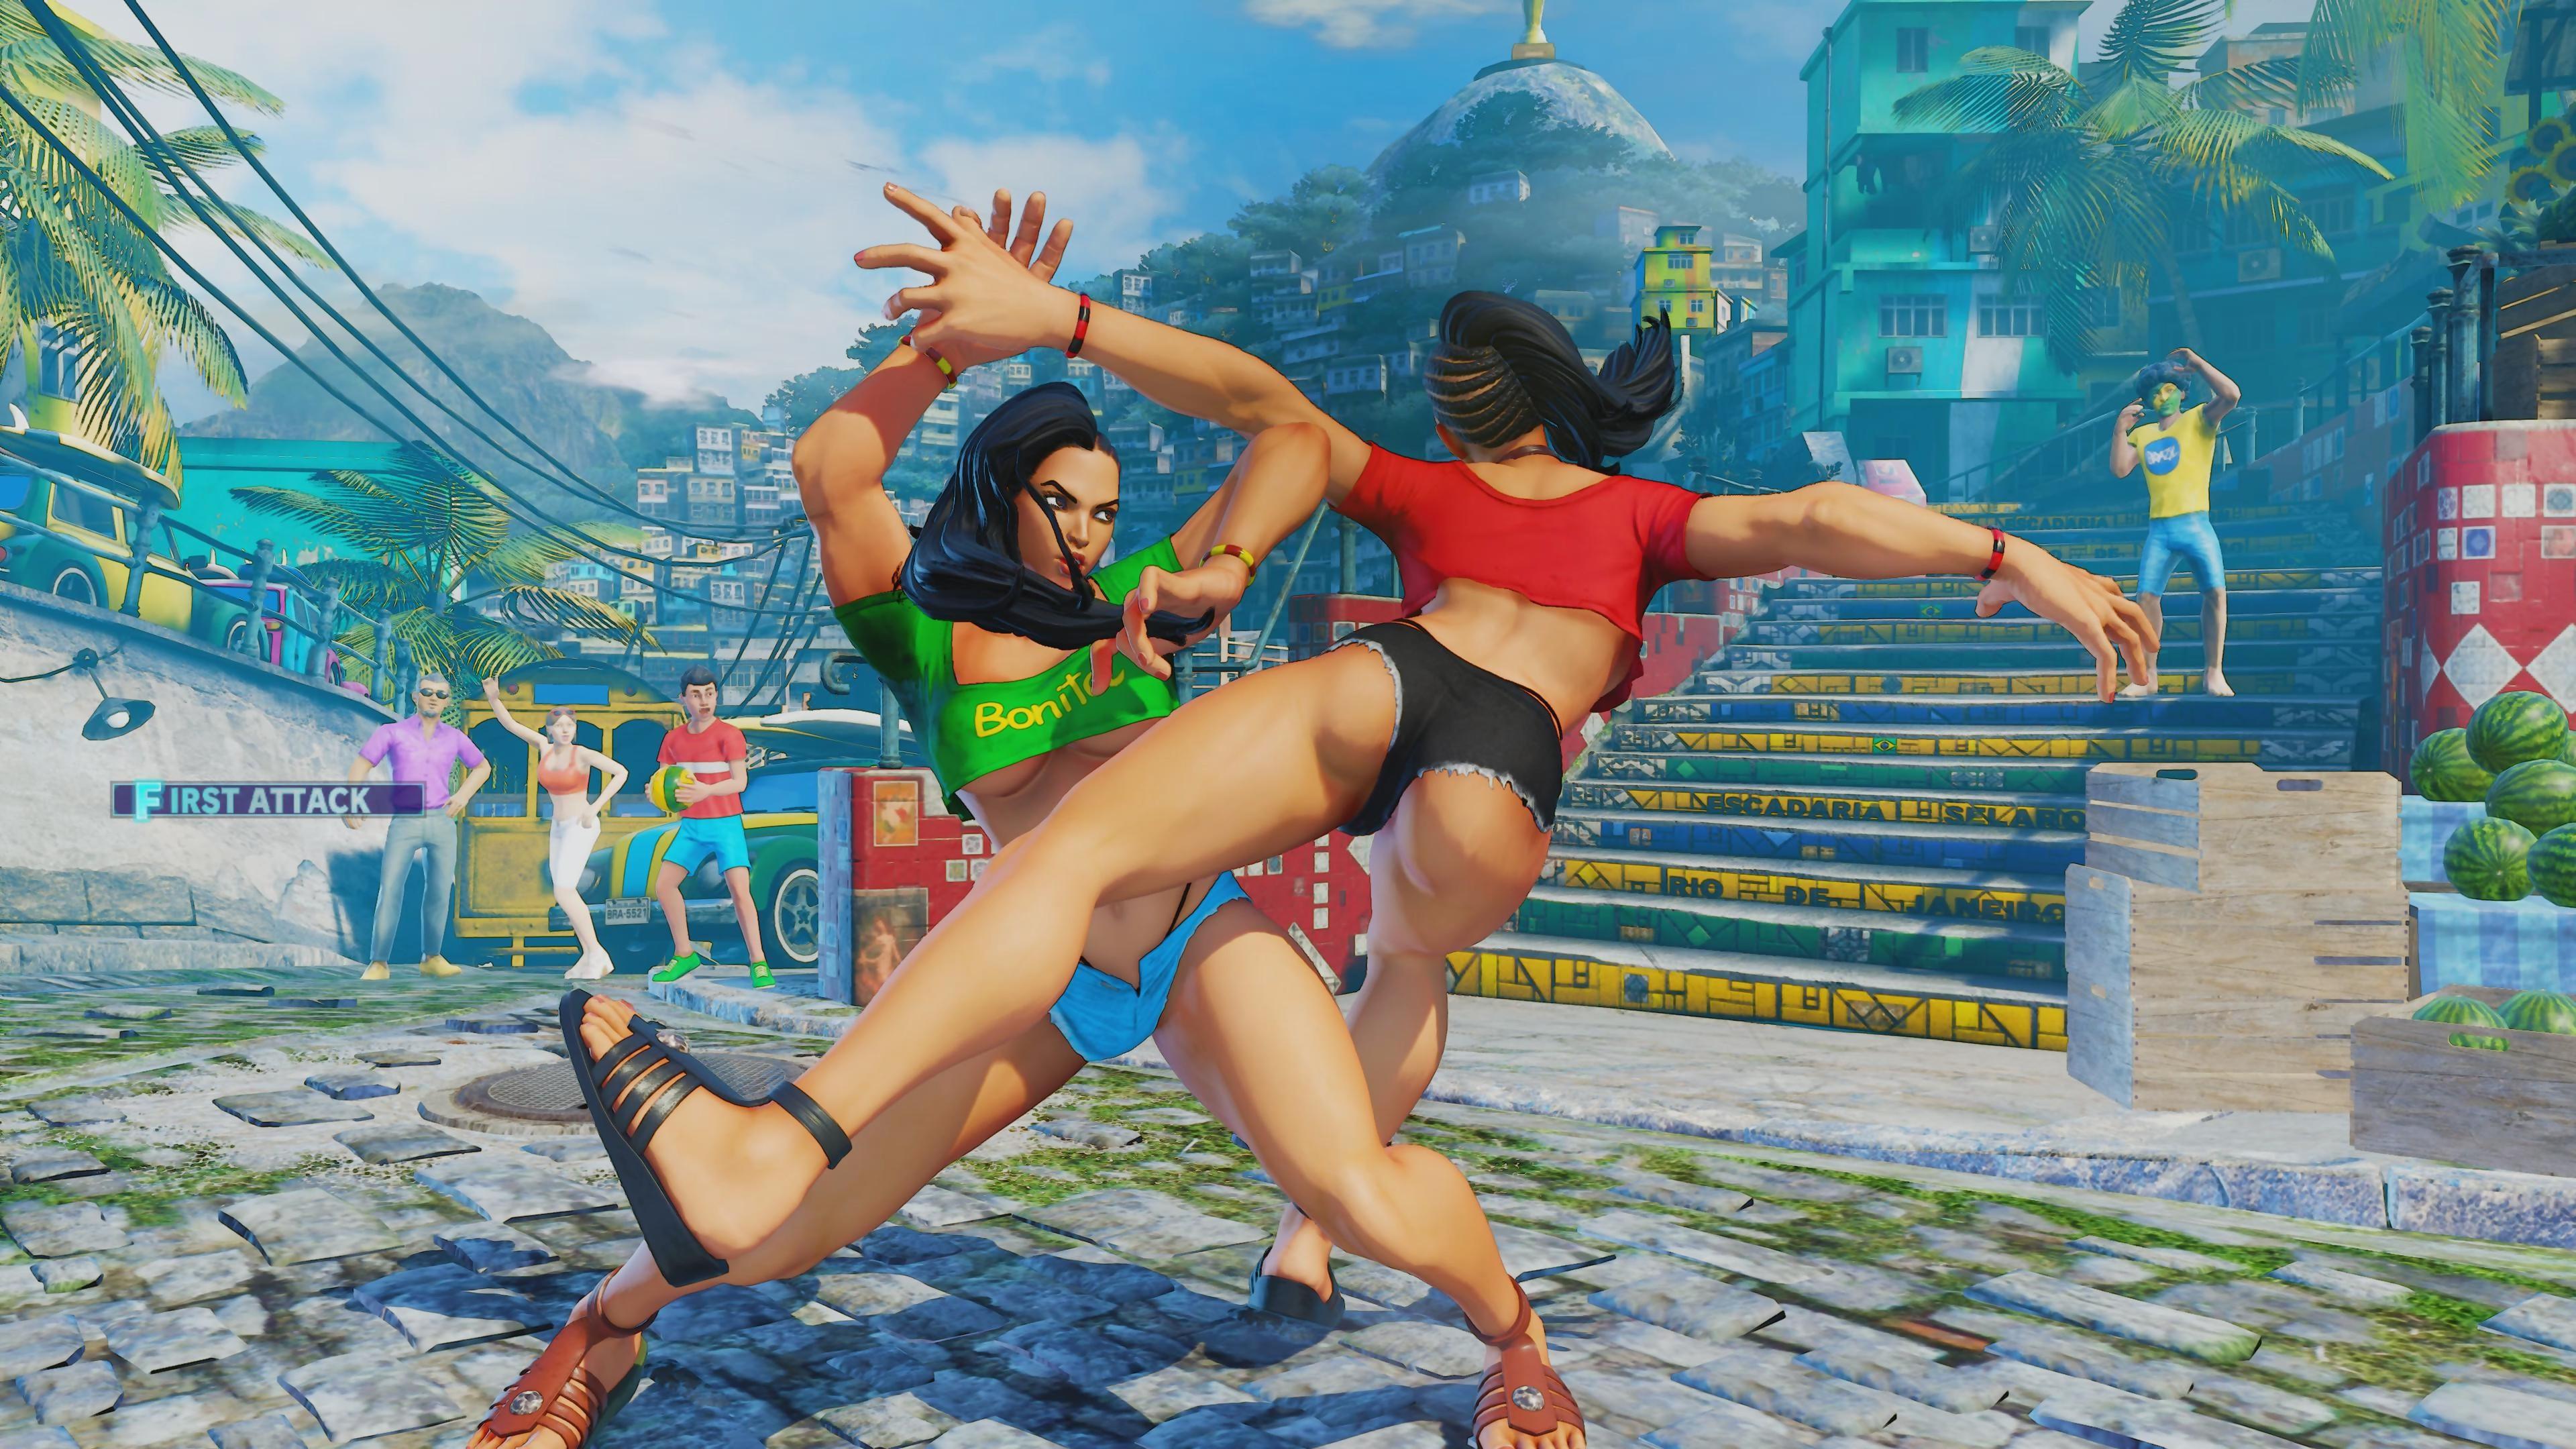 Street Fighter 5 : des images méga hot et sexy de Laura Matsuda